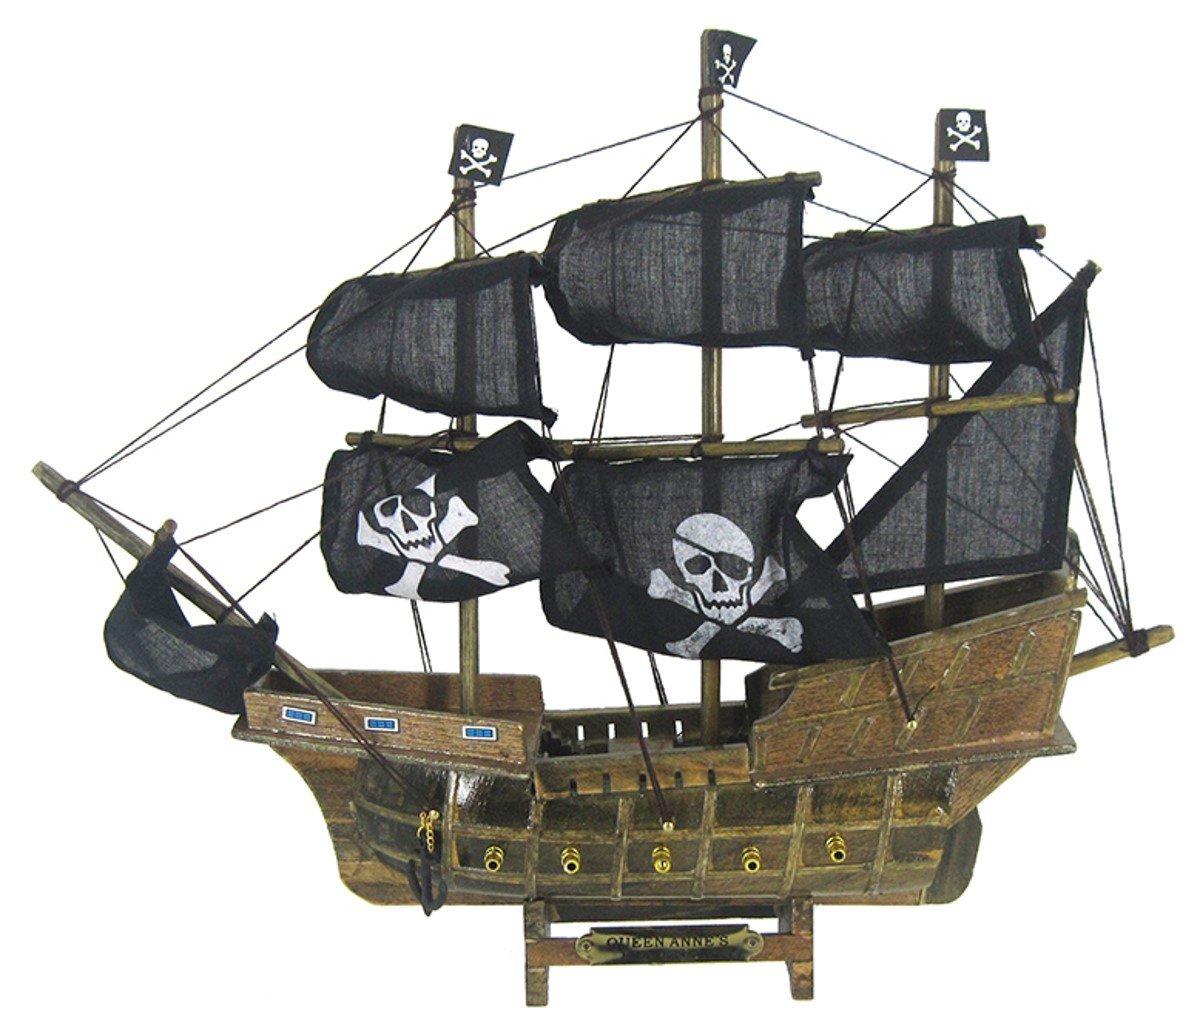 Chesapeake Bay Wood Pirate Ship 69193 13 Inches